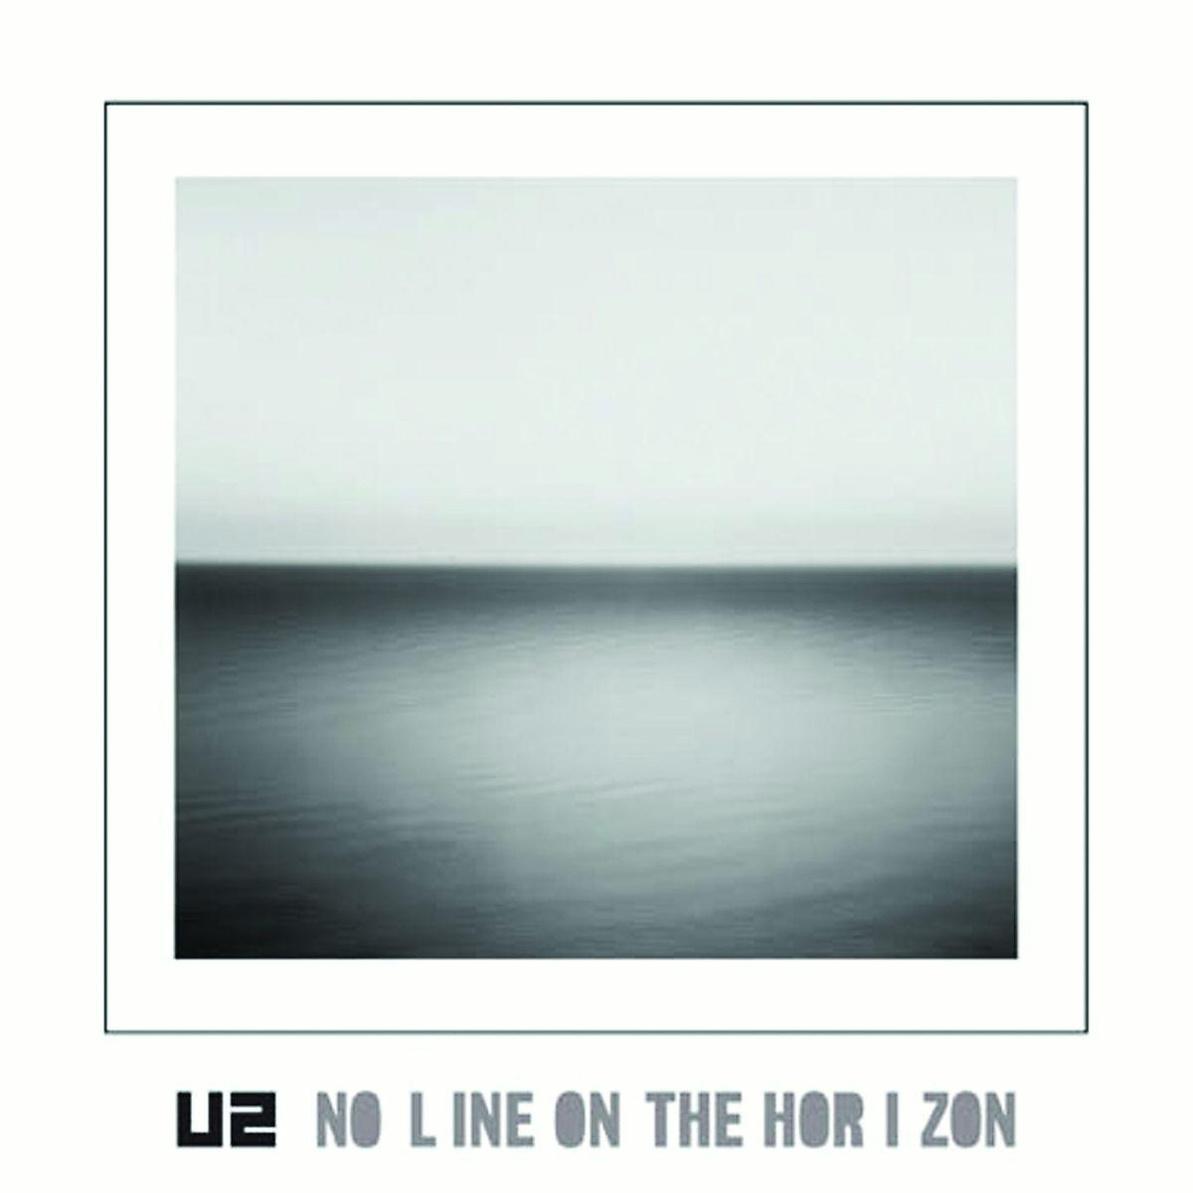 U2 - No Line on the Horizon (Ltd.Digi Edt.)